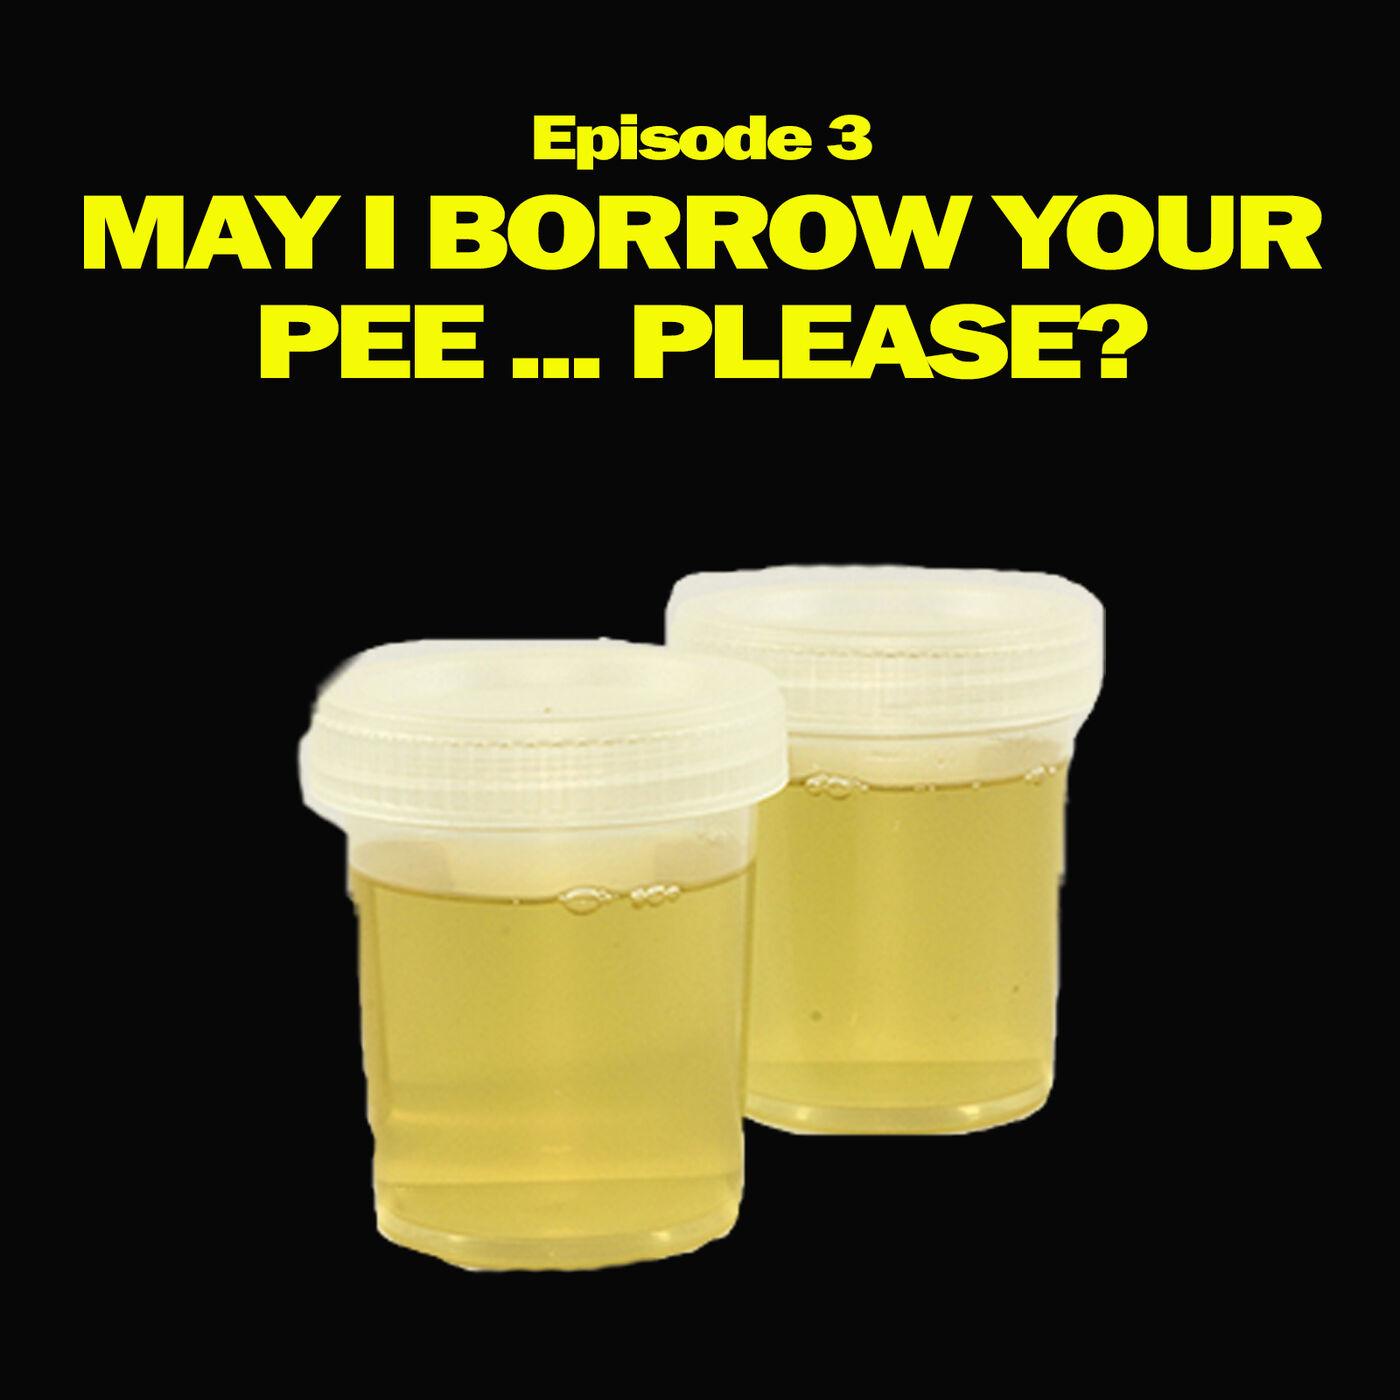 Artwork for May I Borrow Your Pee? Please.